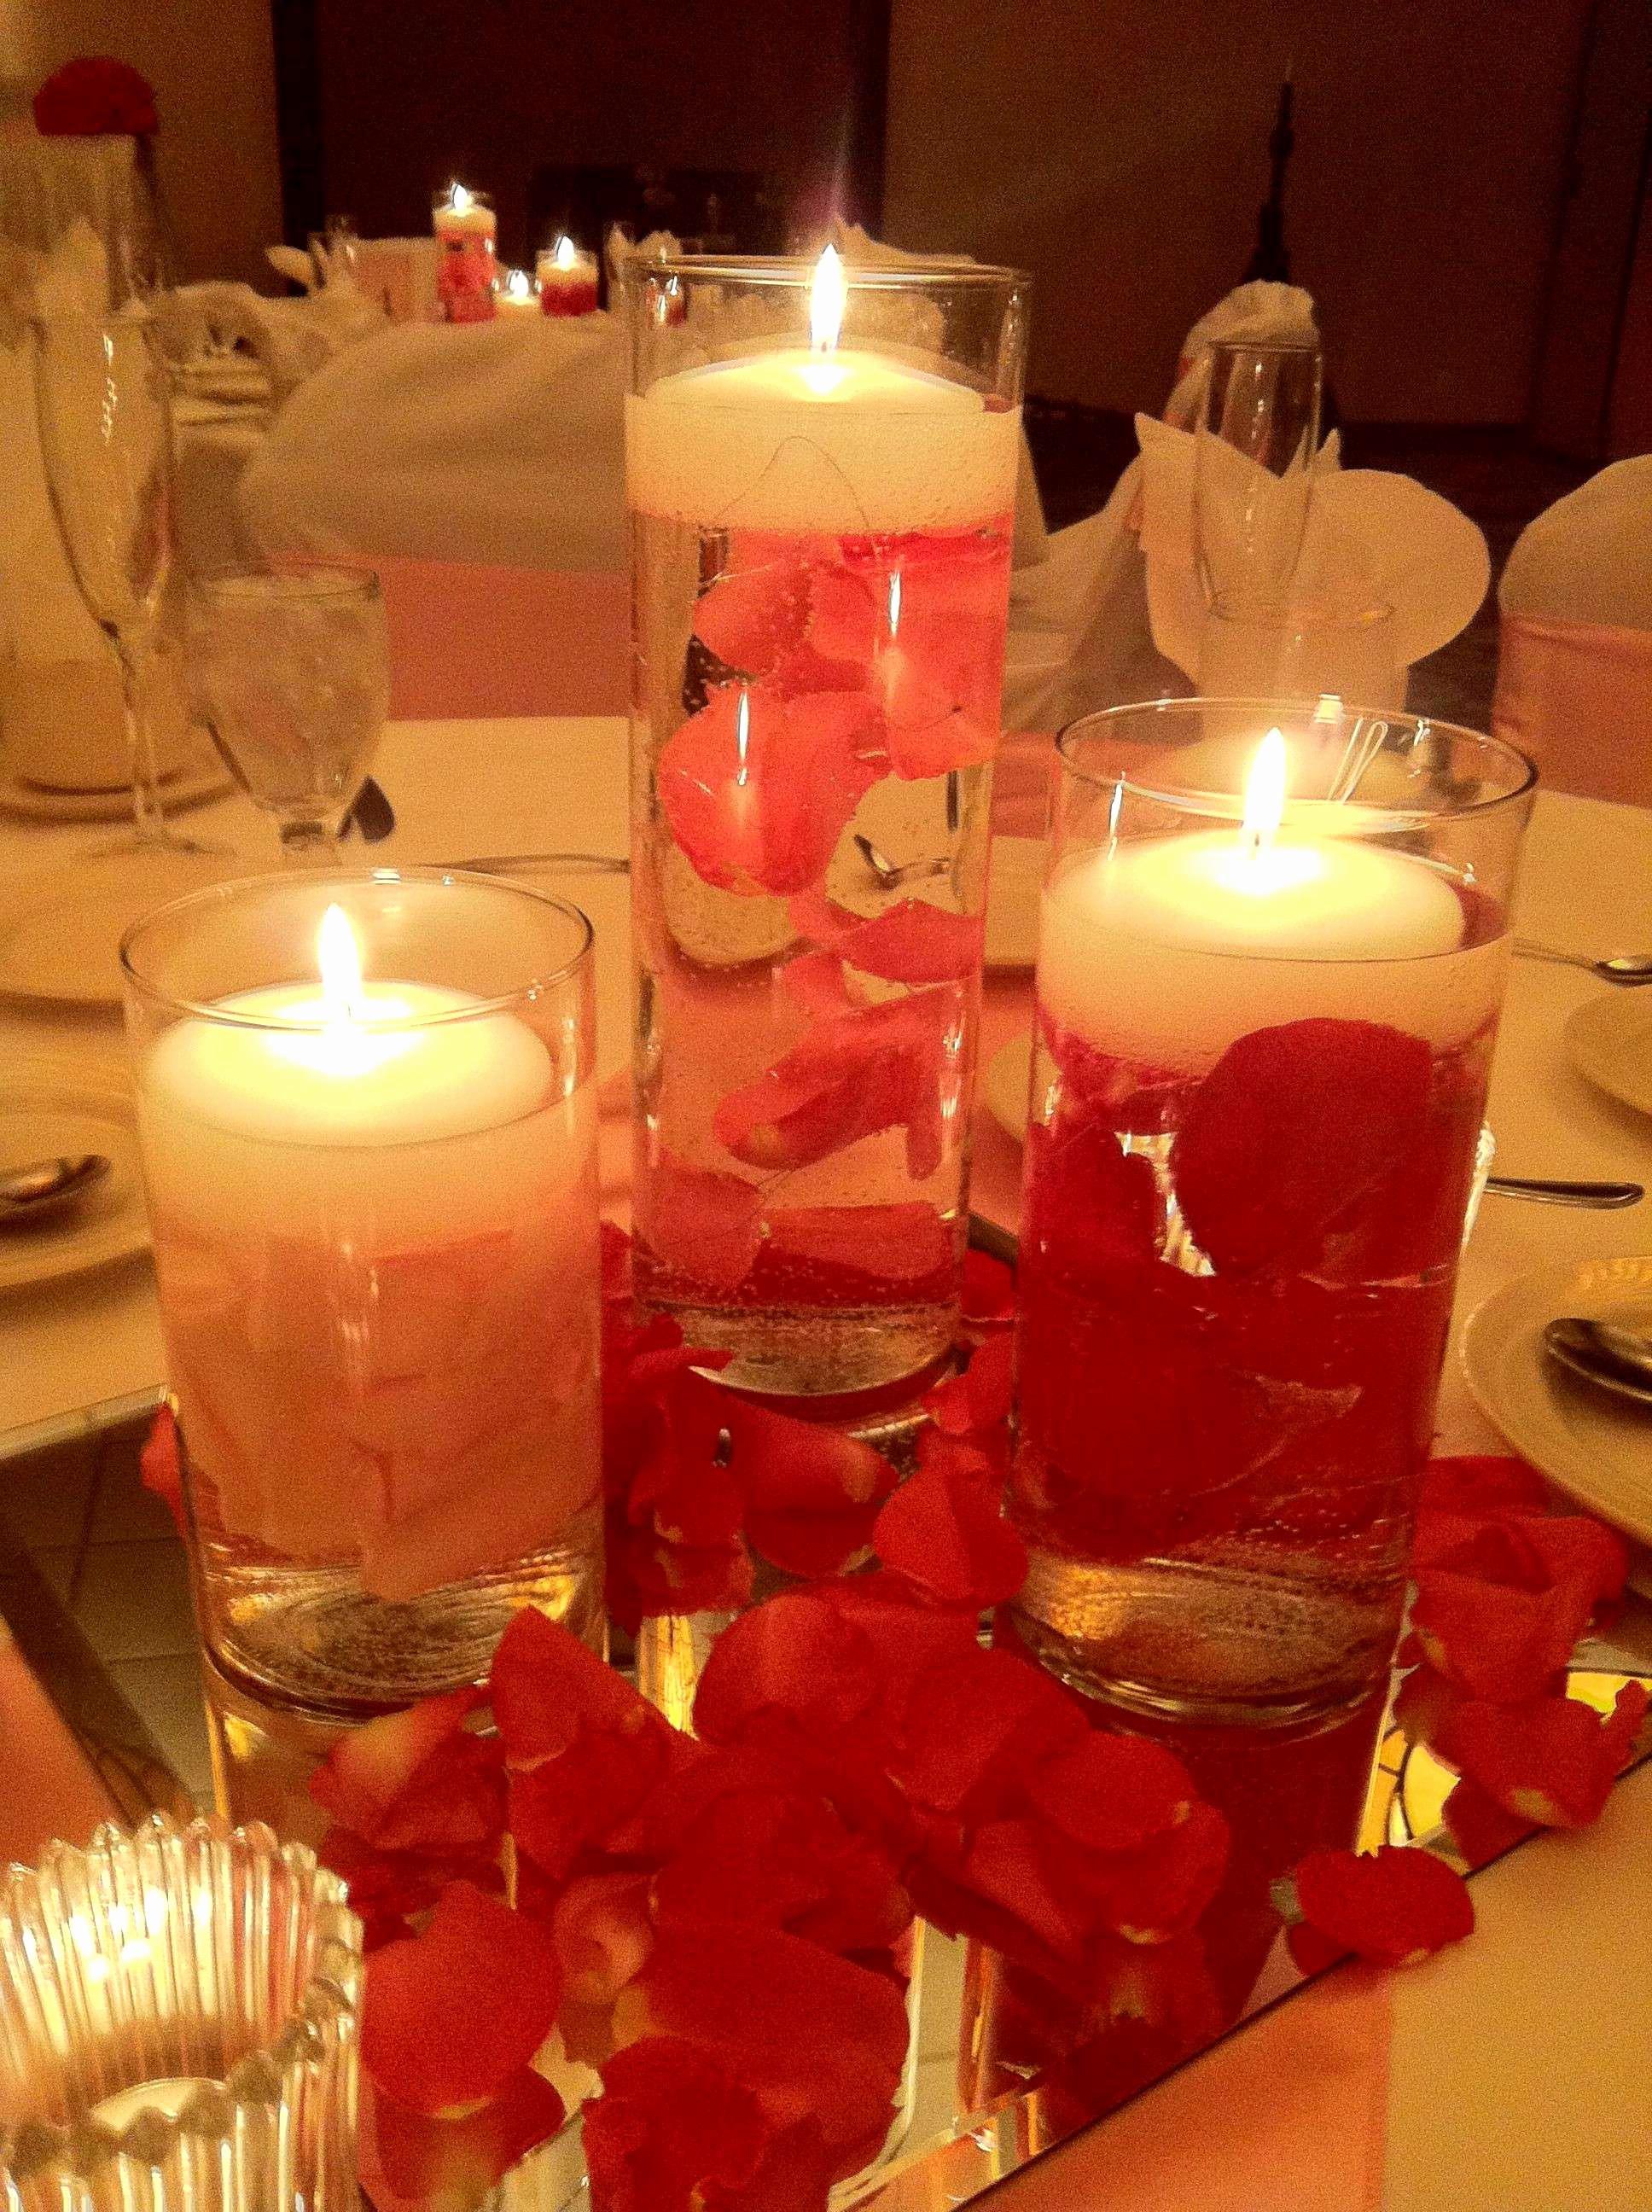 4 x 18 cylinder vase of 19 elegant glass cylinder vases dollar tree bogekompresorturkiye com for gallery things needed for a wedding new dollar tree wedding decorations awesome h vases dollar vase